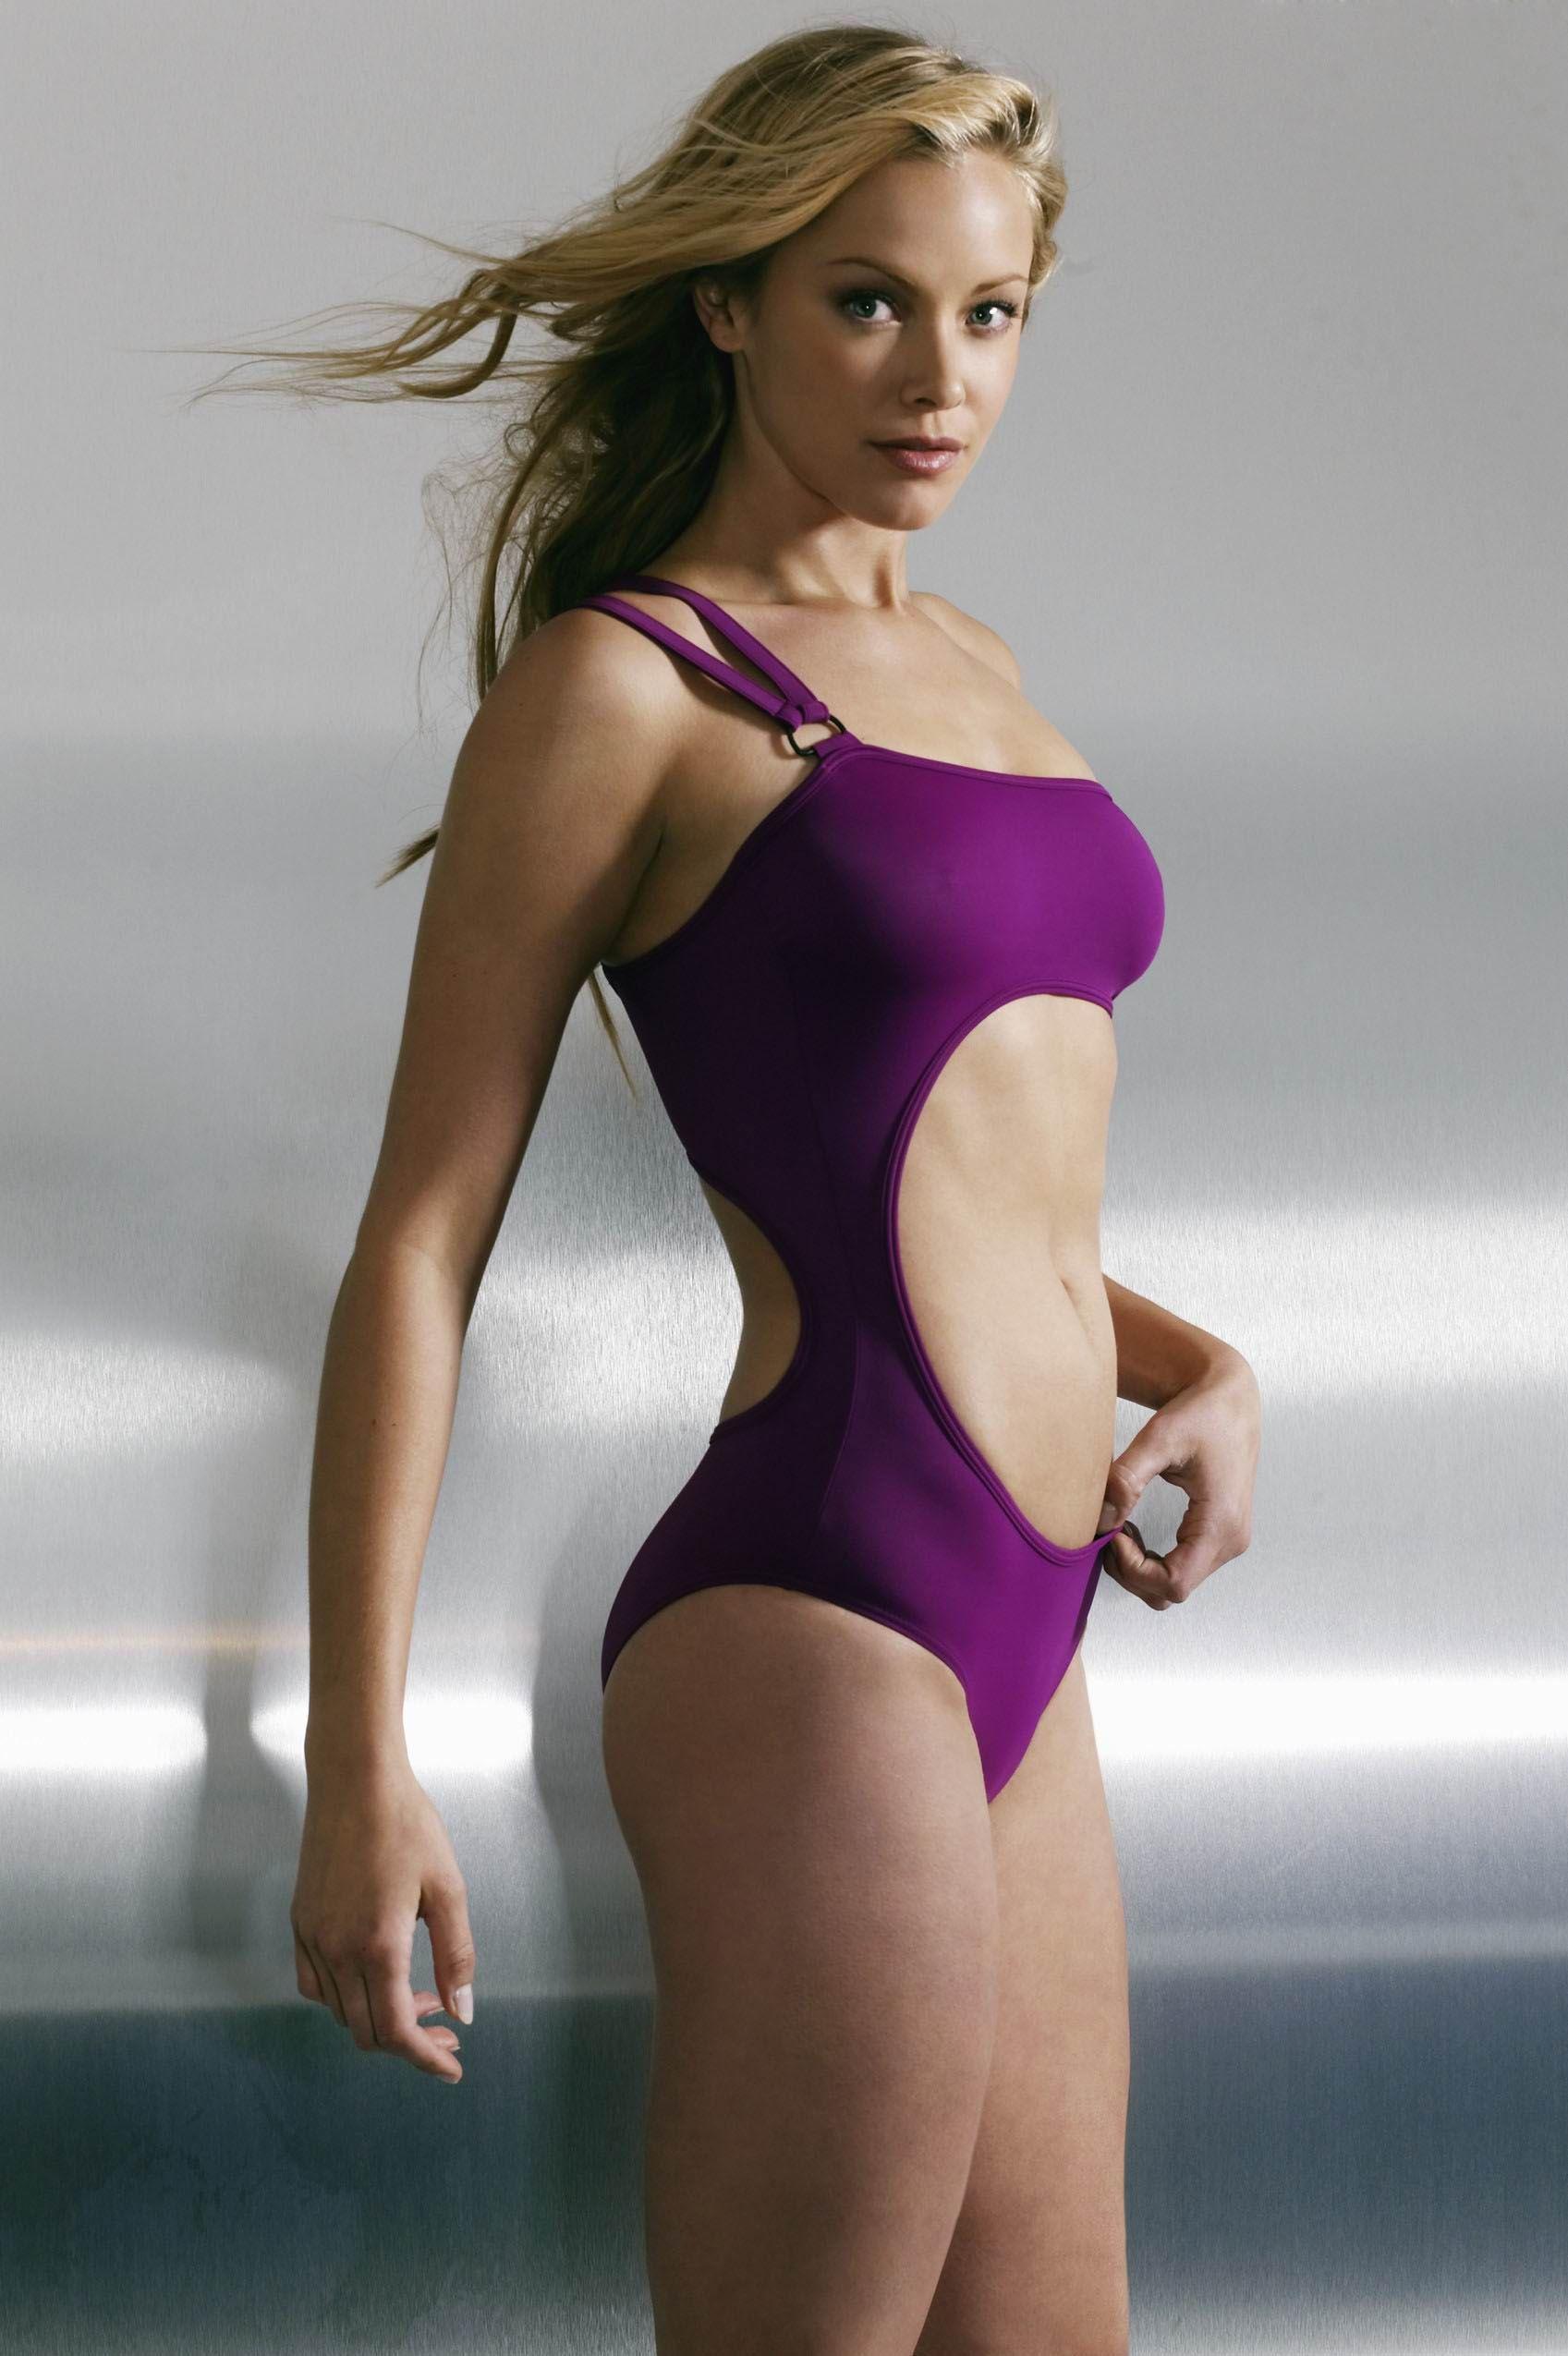 Bikini Kristanna Loken nude photos 2019